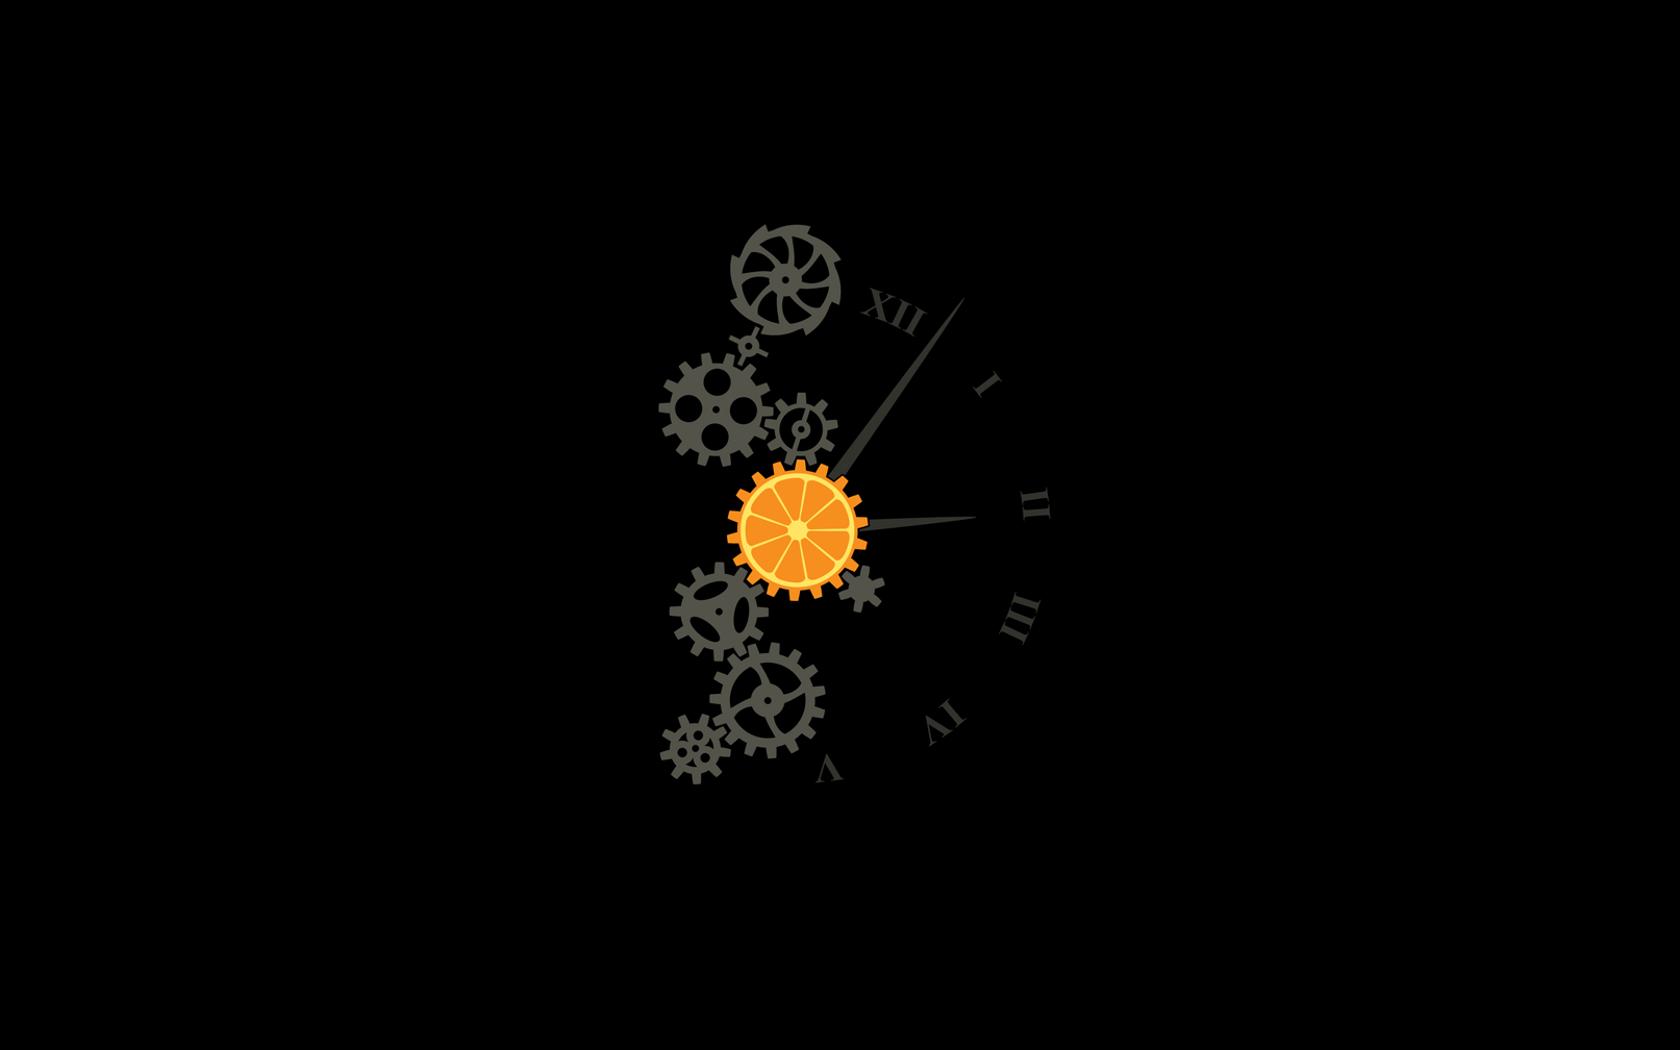 Clockwork Orange обои And фон 1680x1050 Id196410